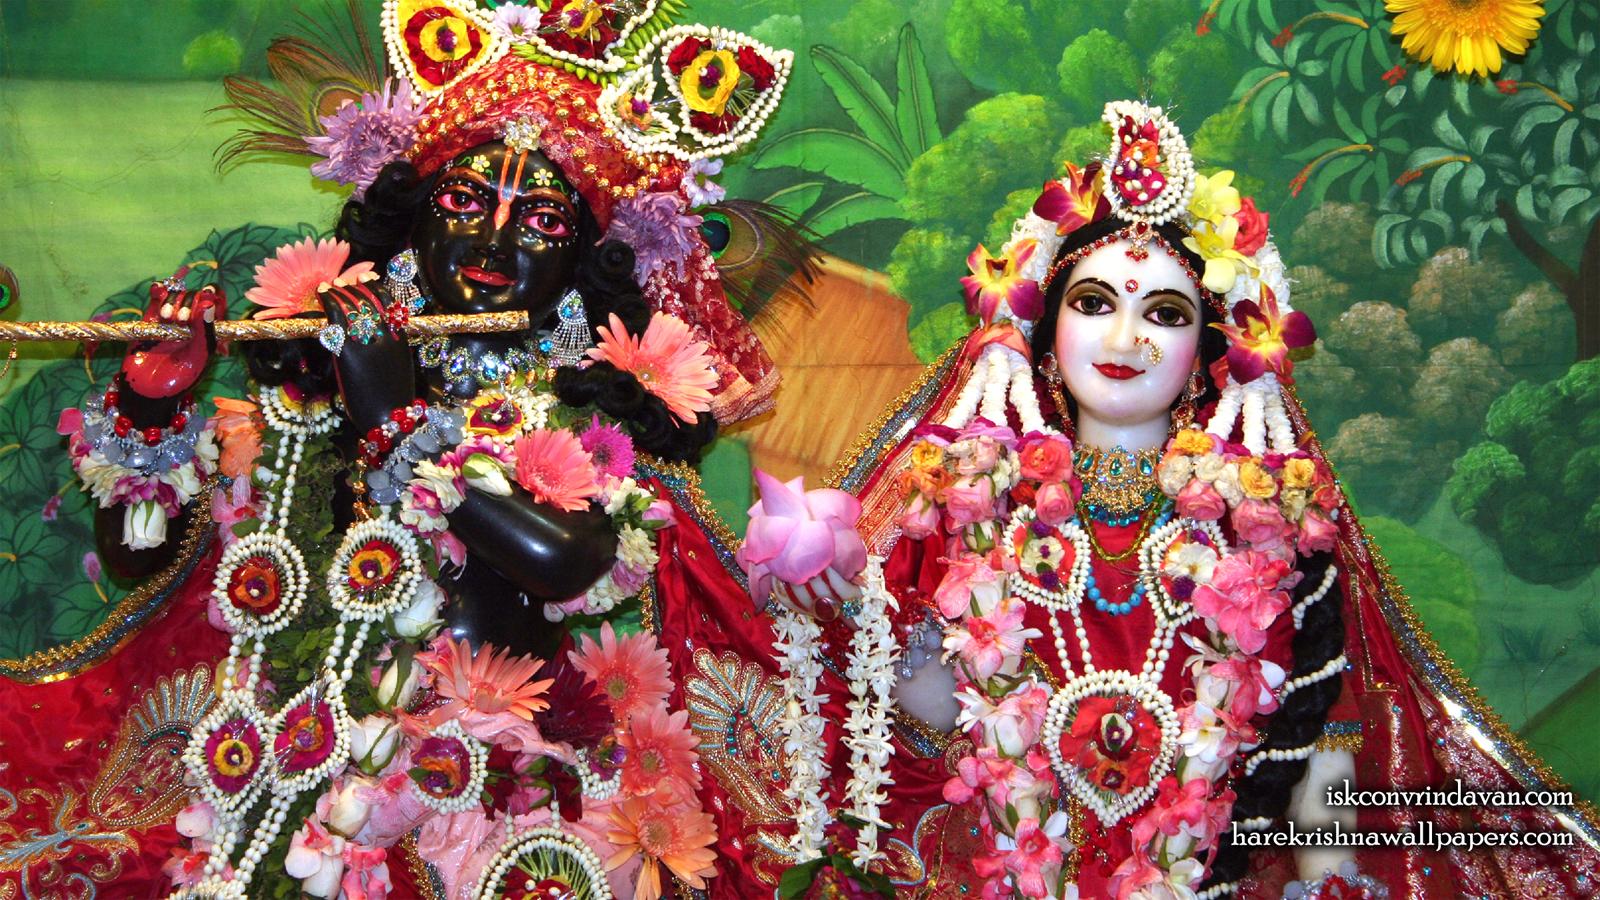 Sri Sri Radha Shyamsundar Close up Wallpaper (012) Size 1600x900 Download